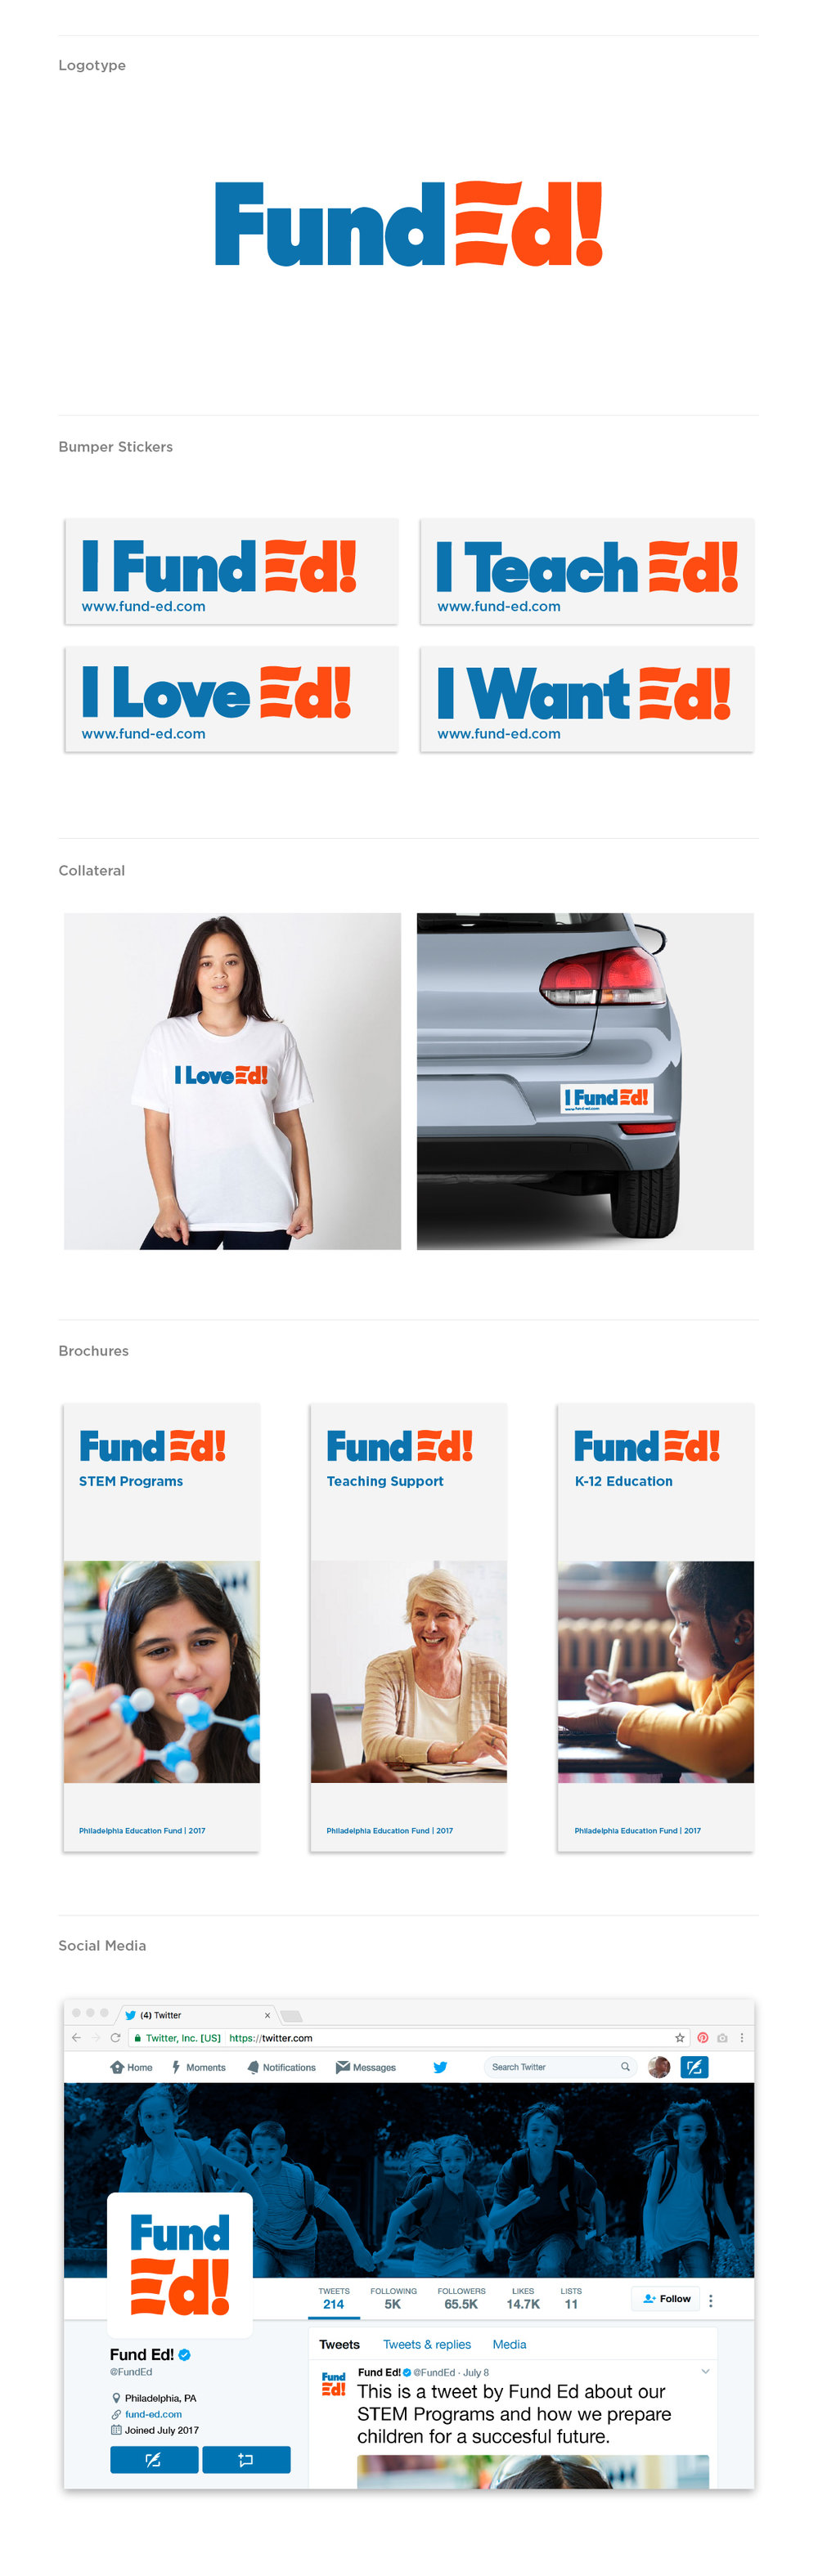 Branding-Fund-Ed.jpg